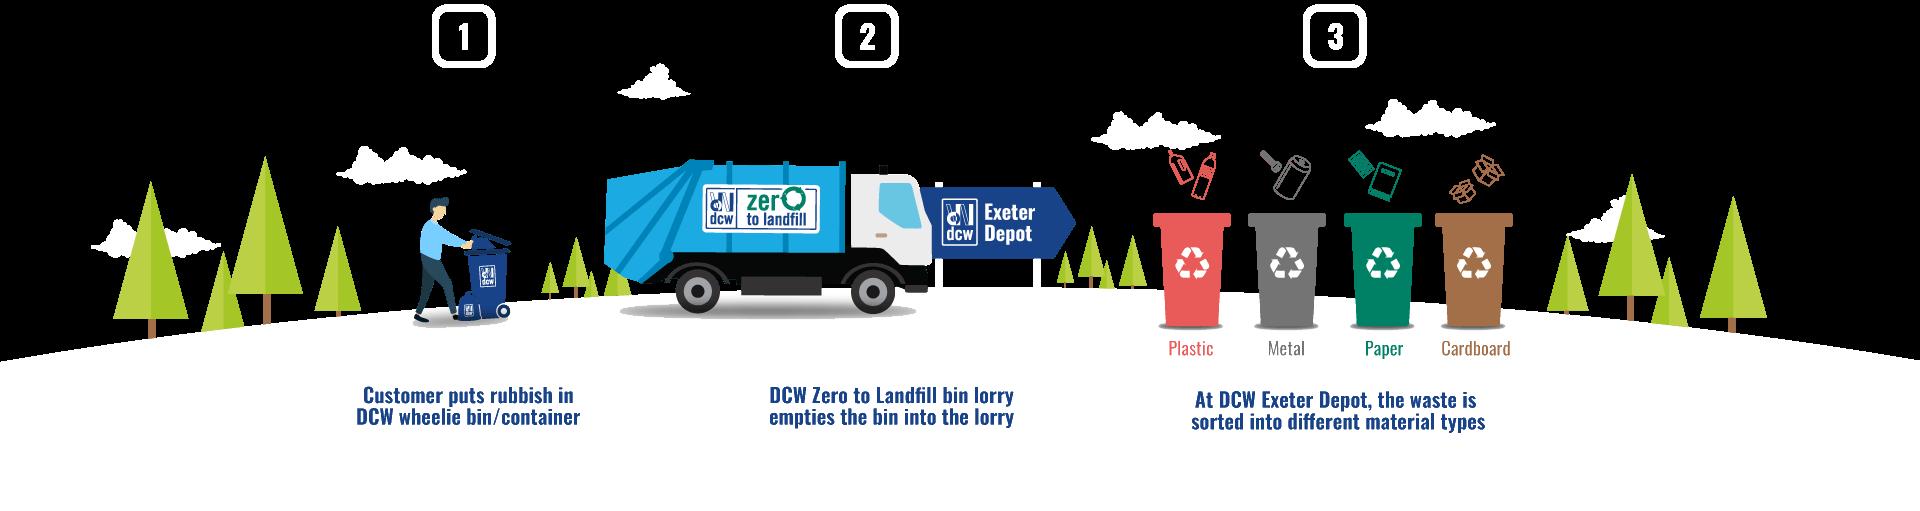 zero to landfill process logo